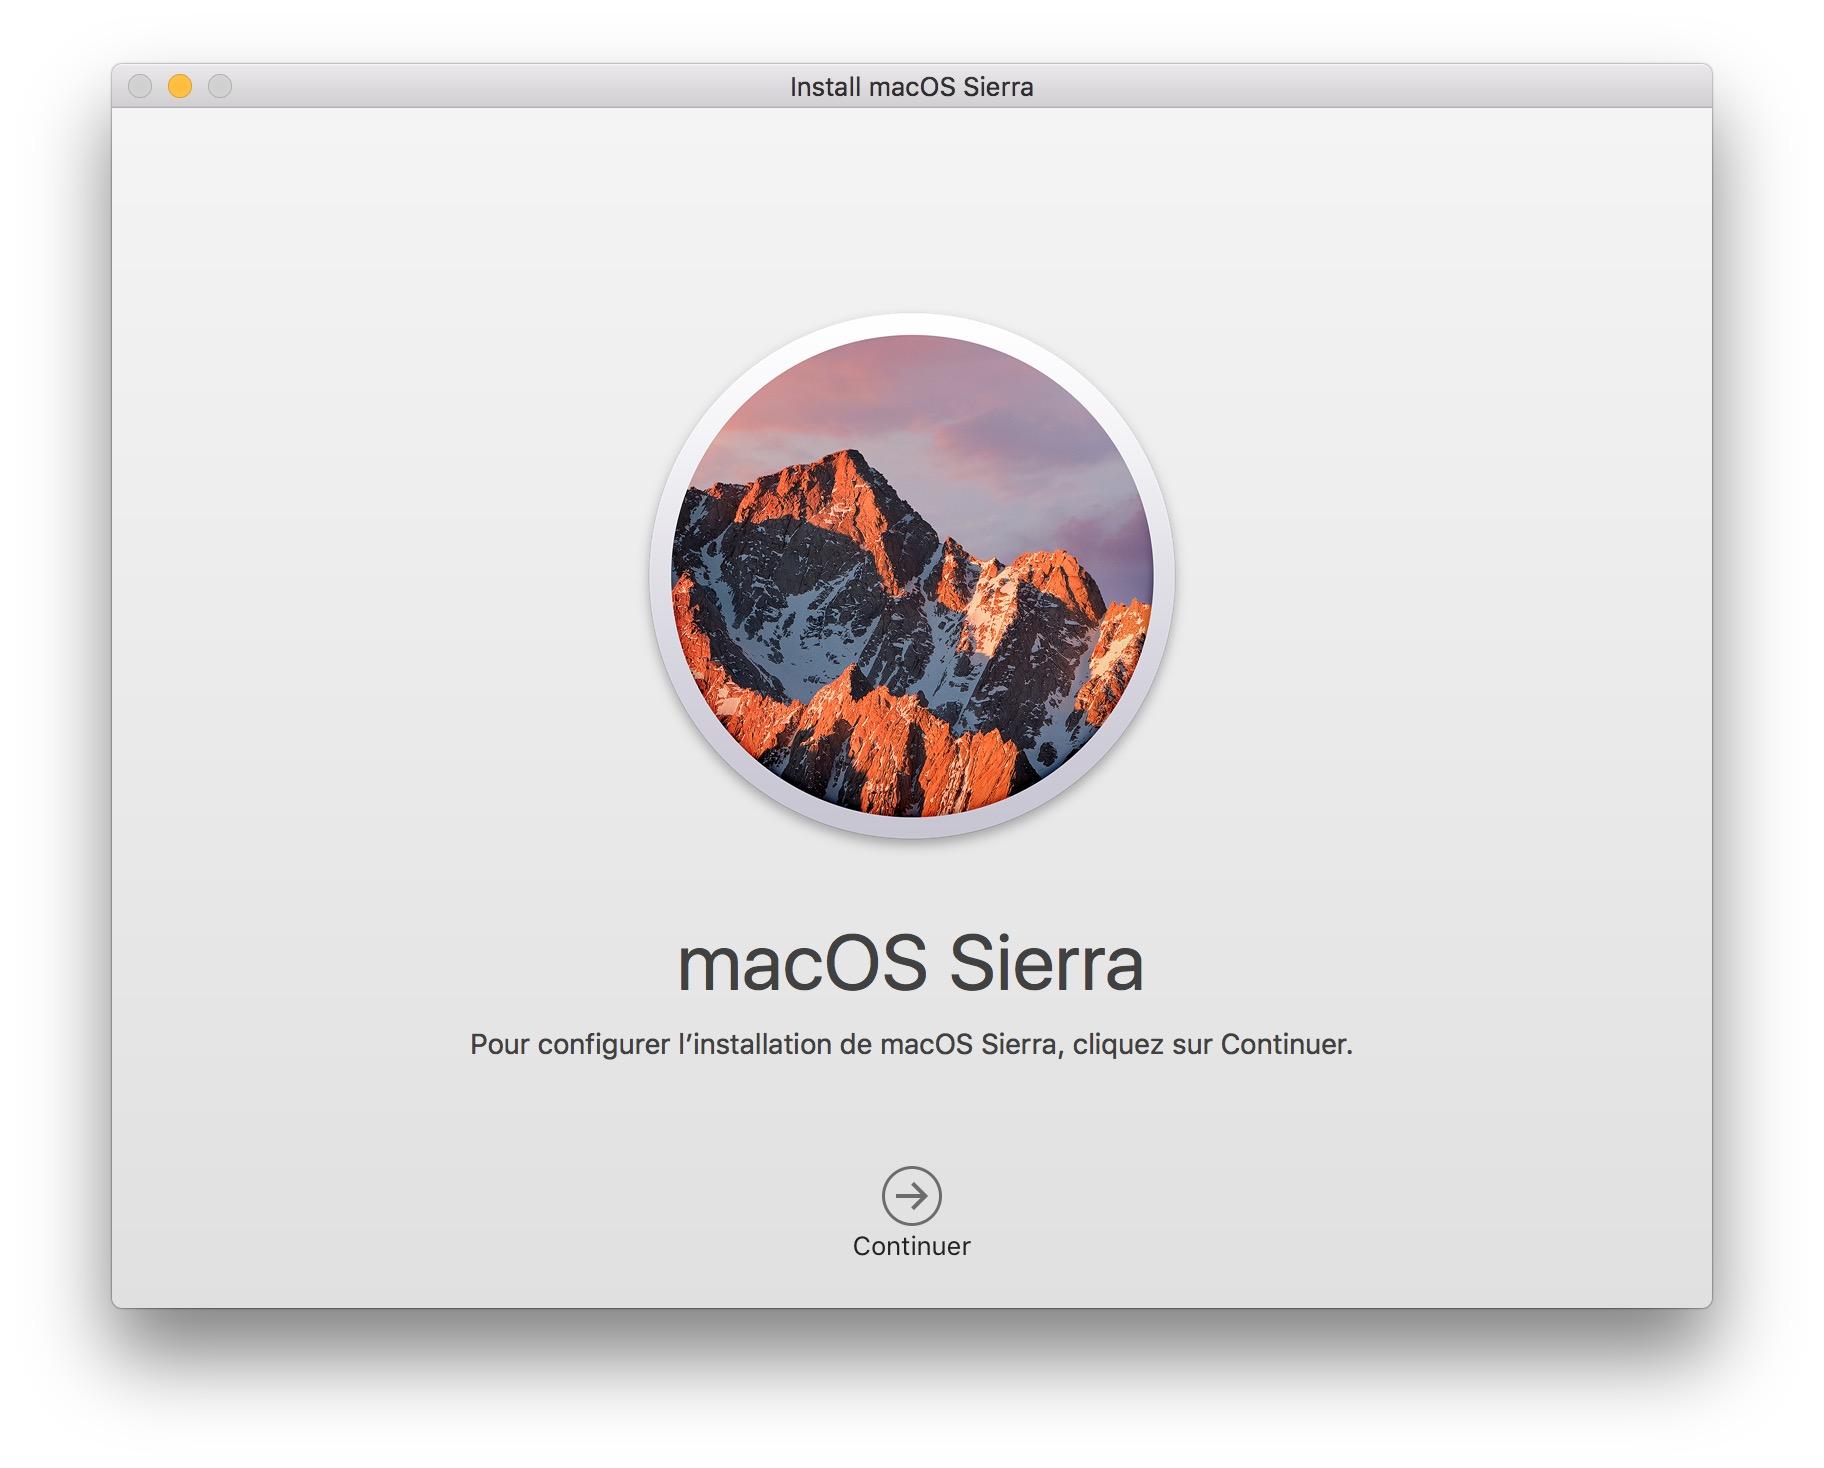 installer macOS Sierra sur Mac mise a jour